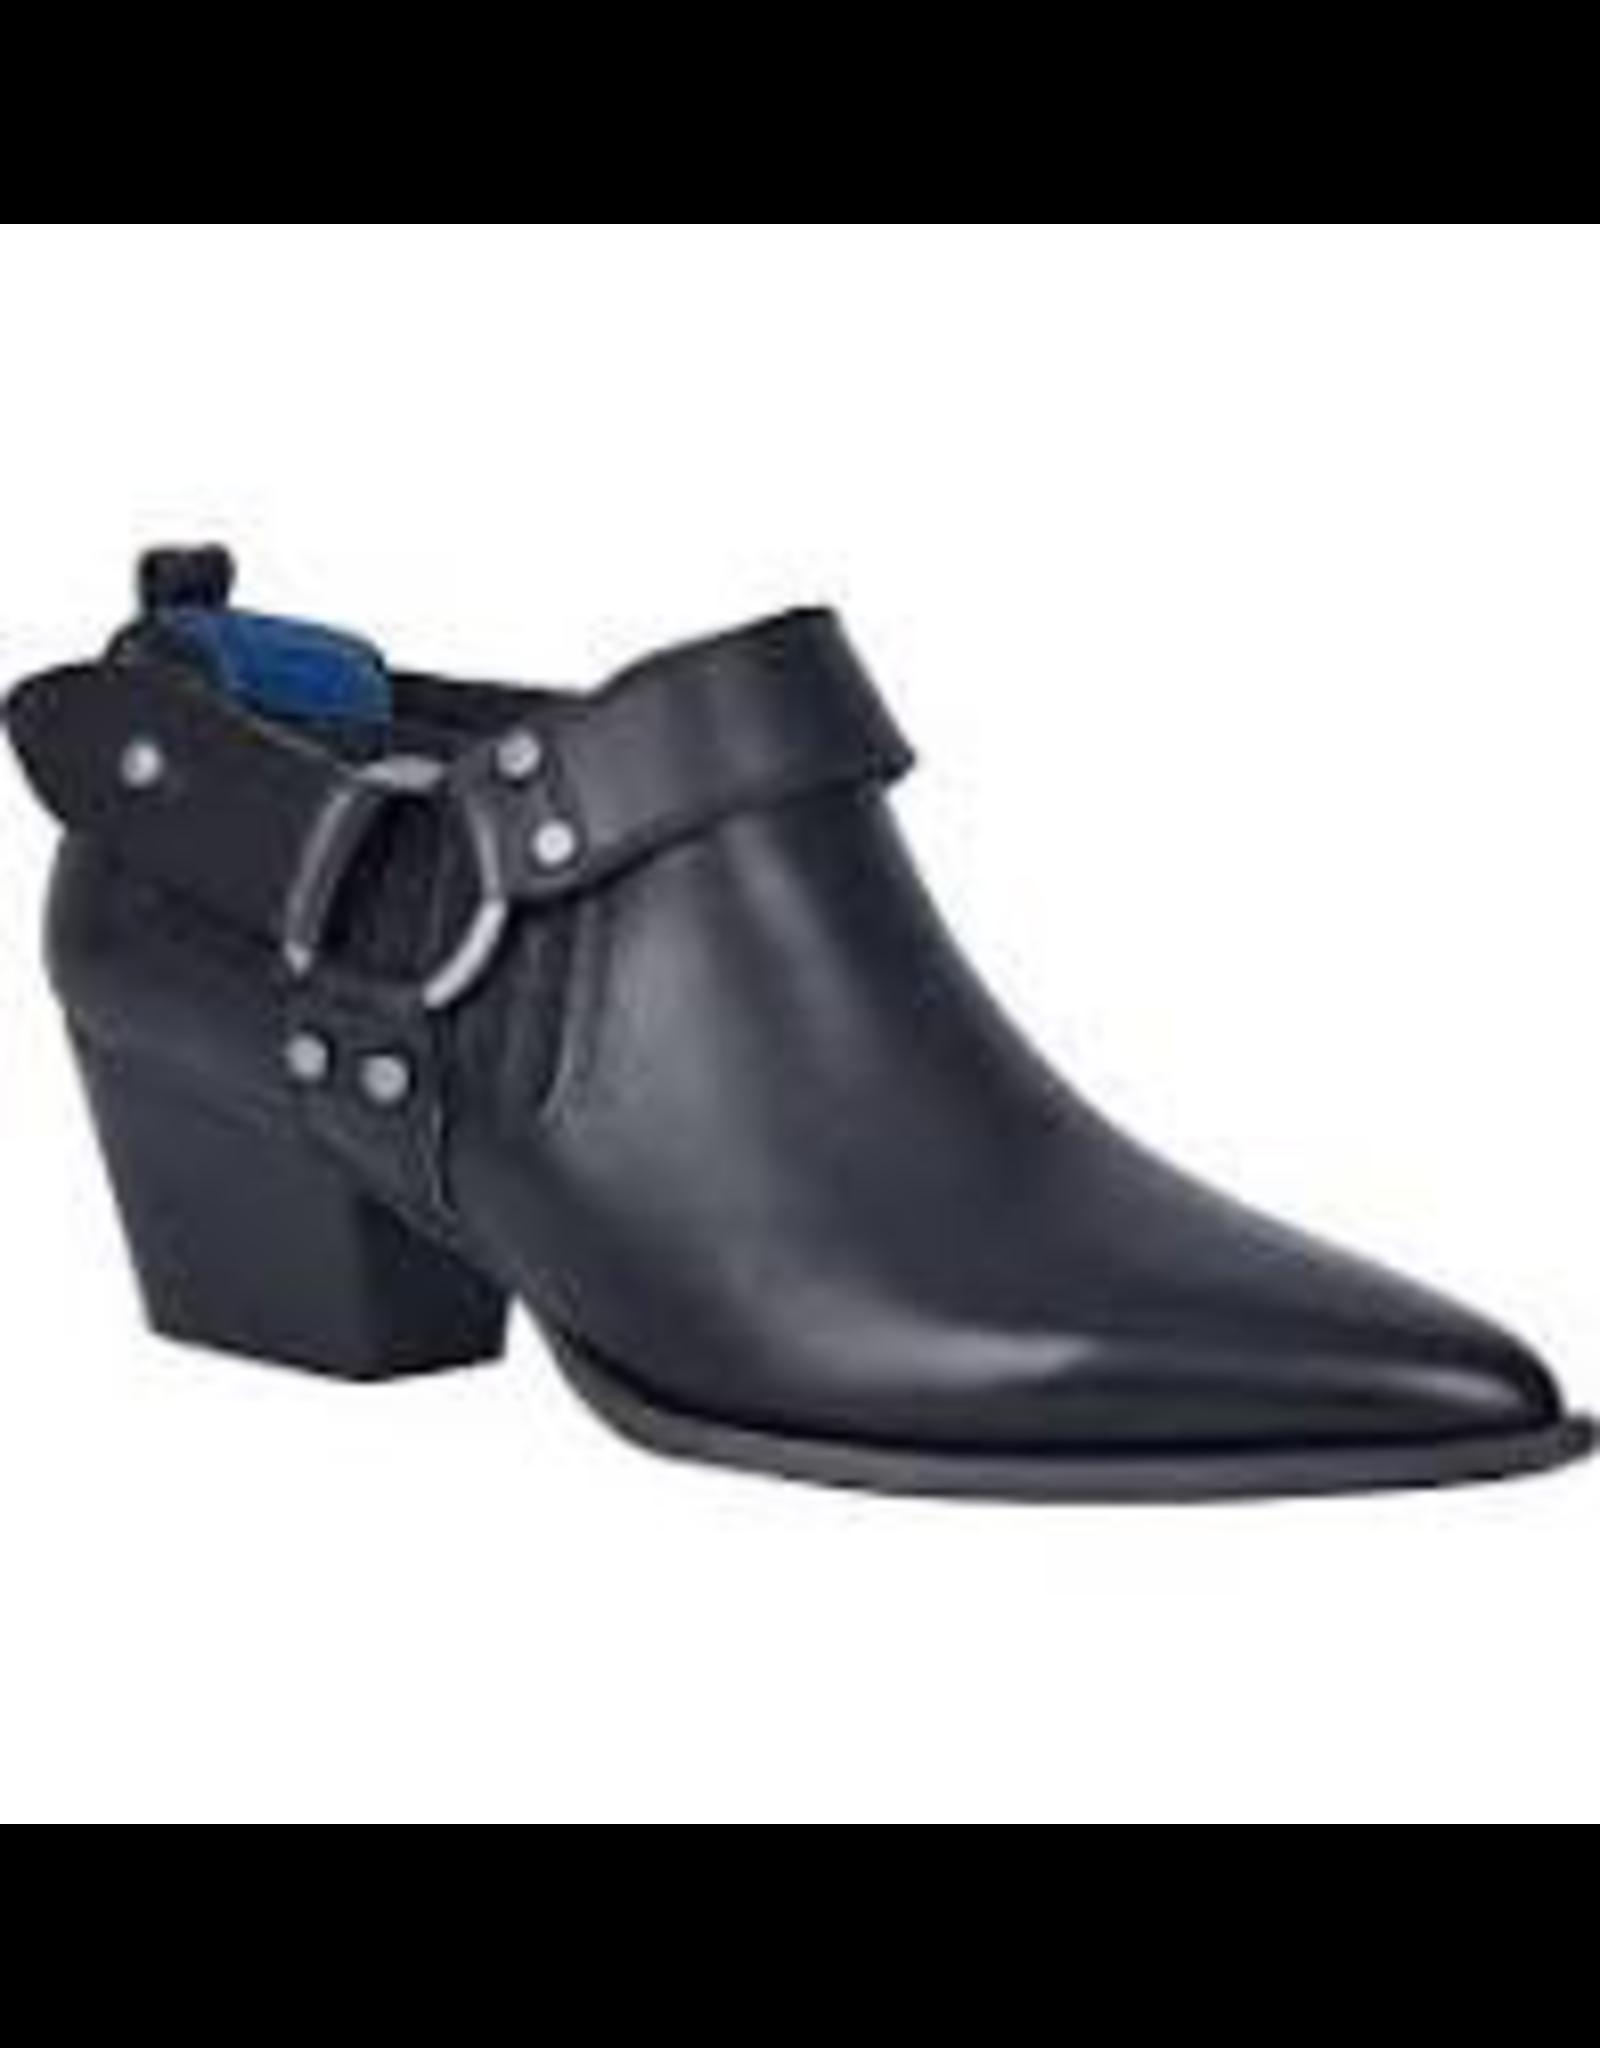 Boots-Women DINGO Kickback<br /> DI106